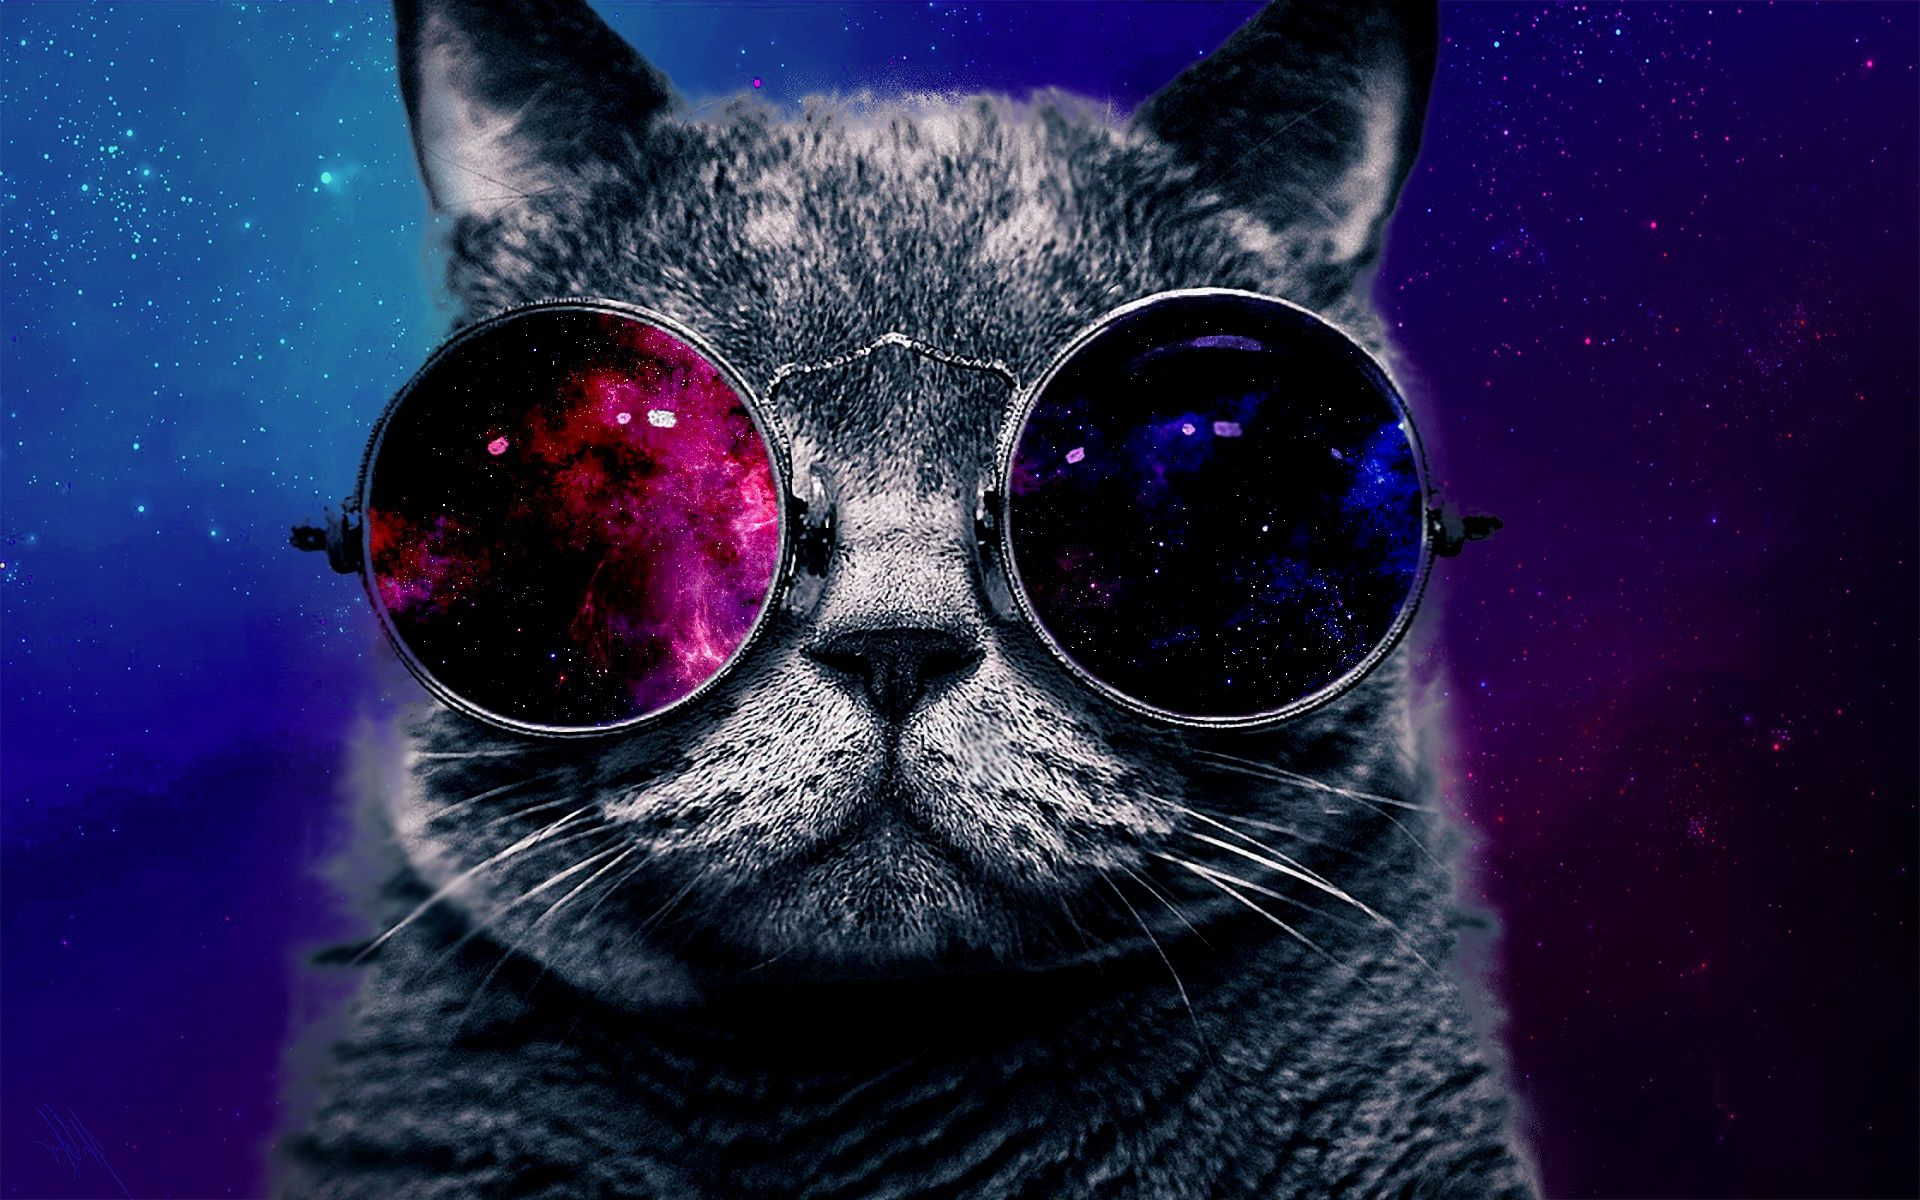 Glasses Cat Galaxy Wallpapers - Top Free Glasses Cat ...